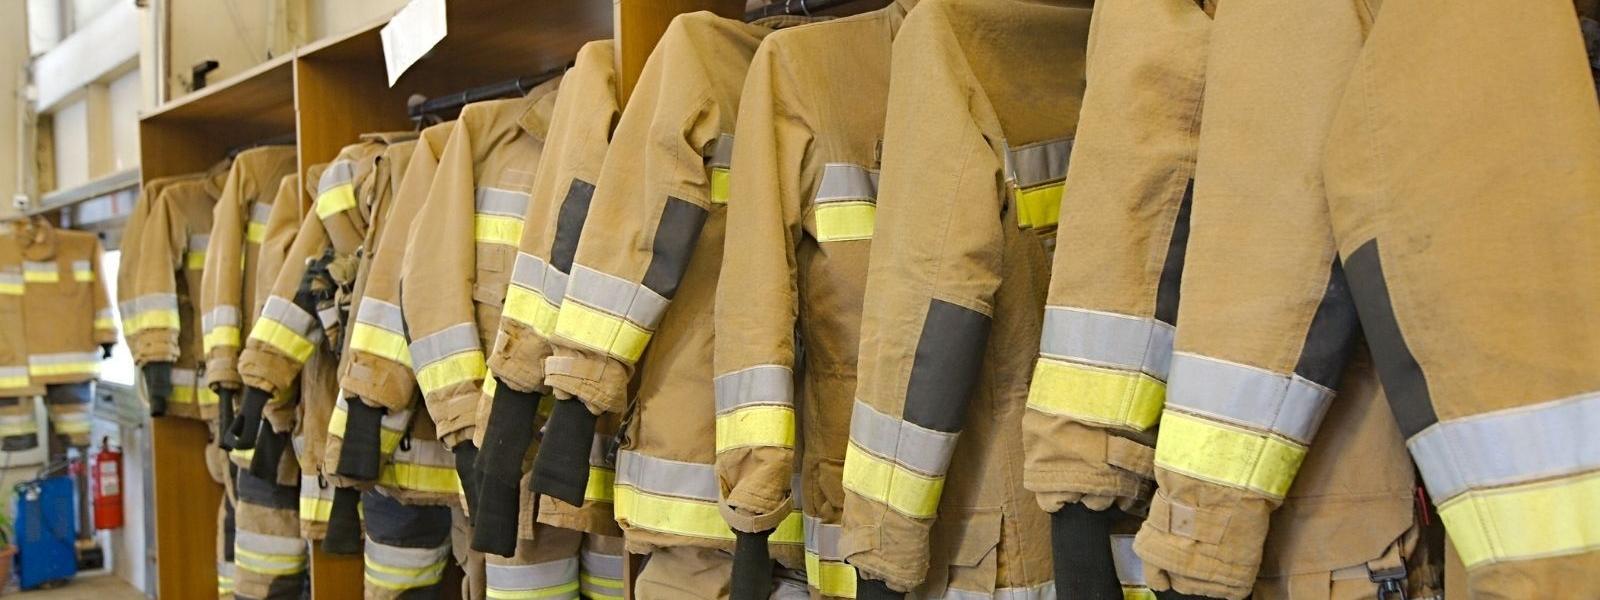 Uniforms on a rack